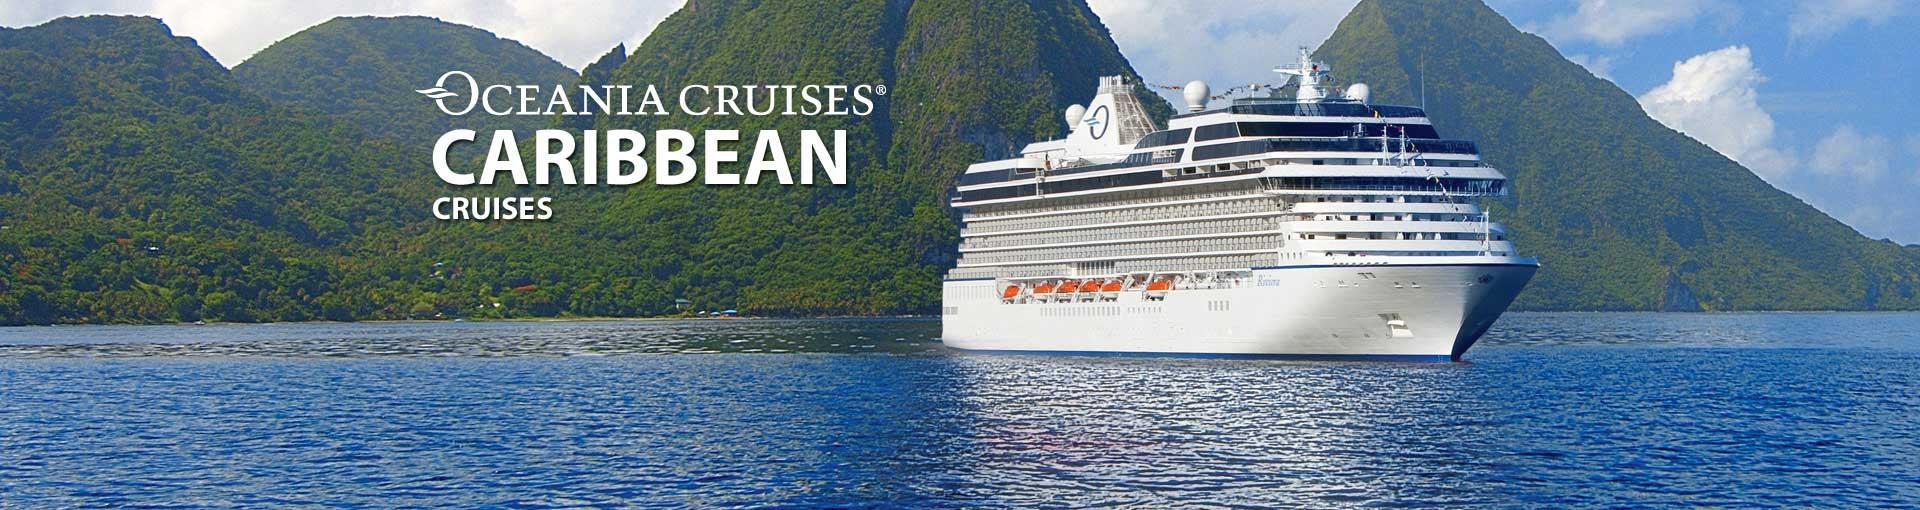 Oceania Cruises Caribbean Cruises